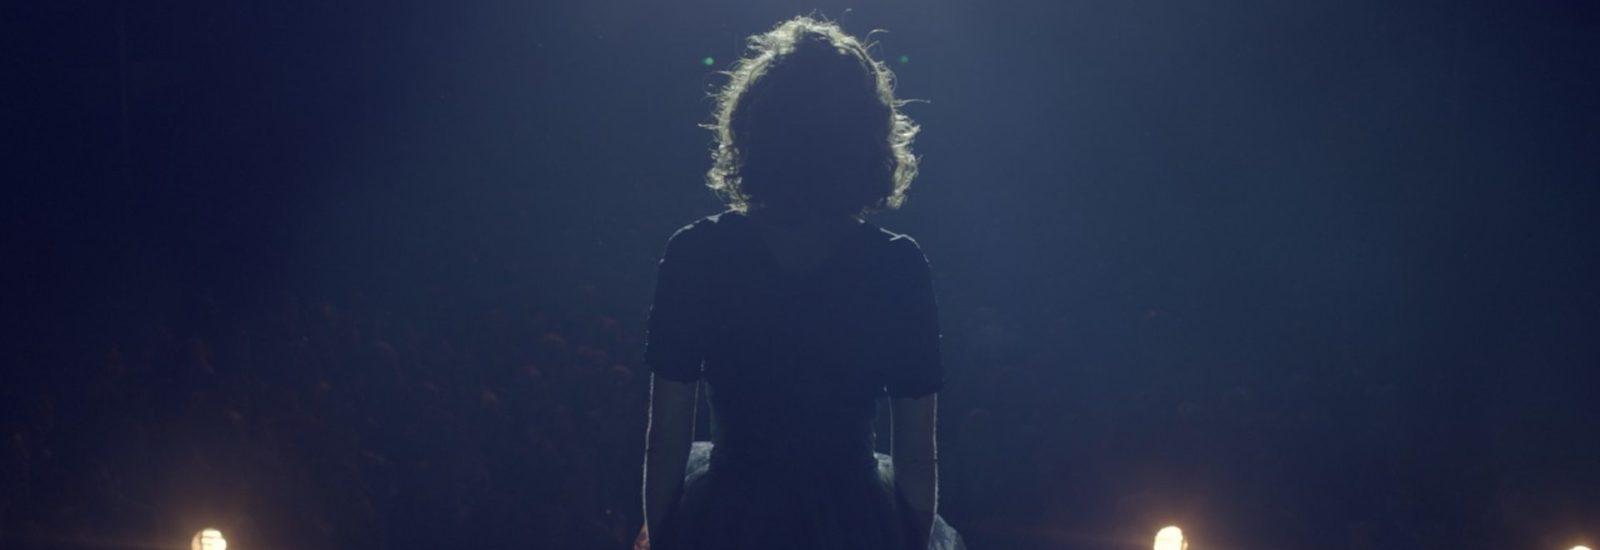 La reina del miedo / Cinemaboutique